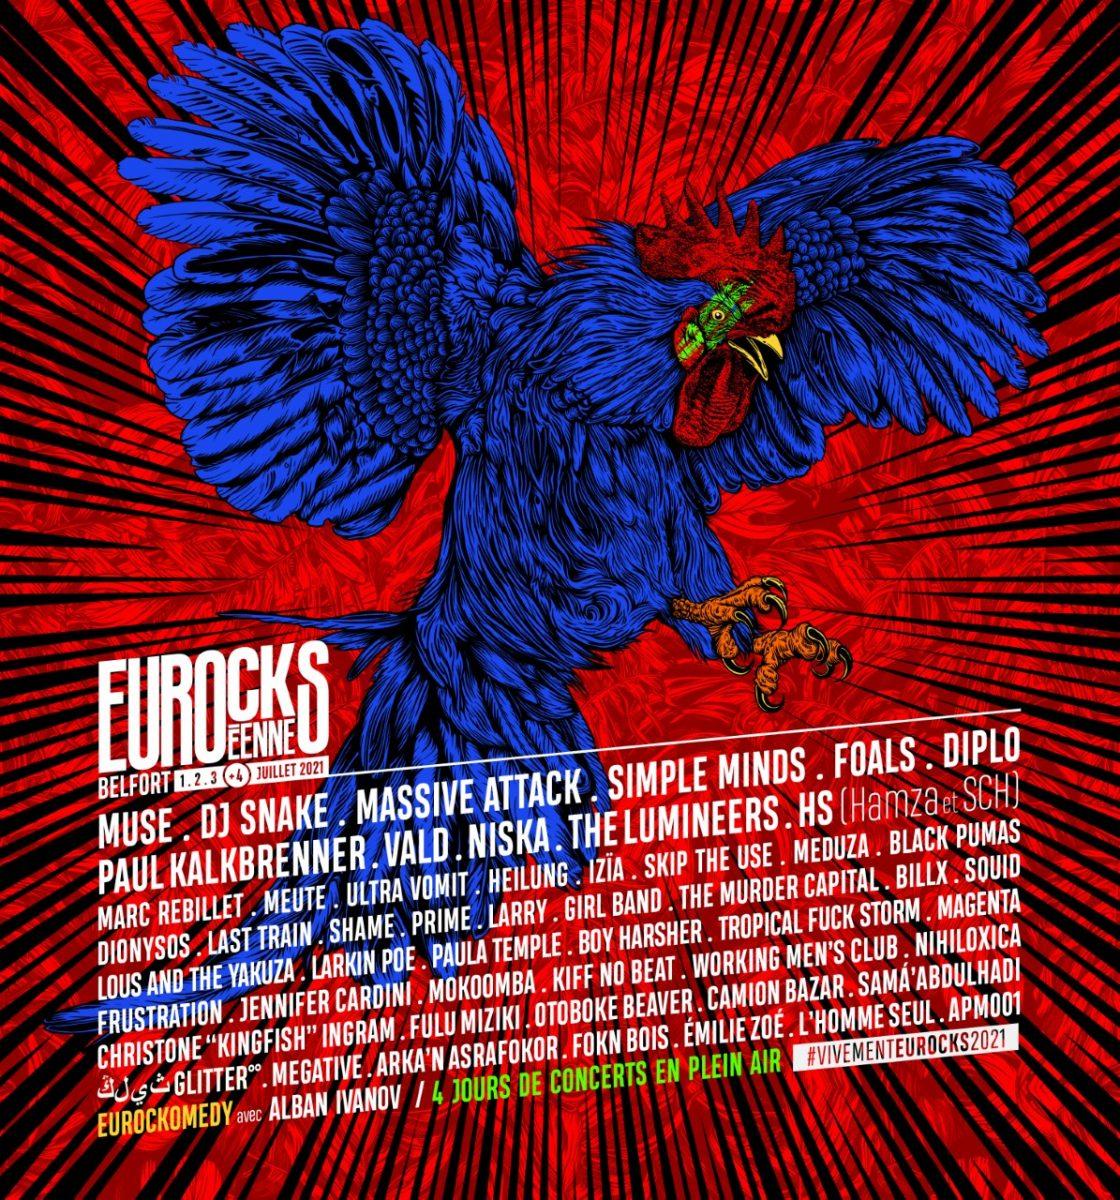 affiche eurocks 2021